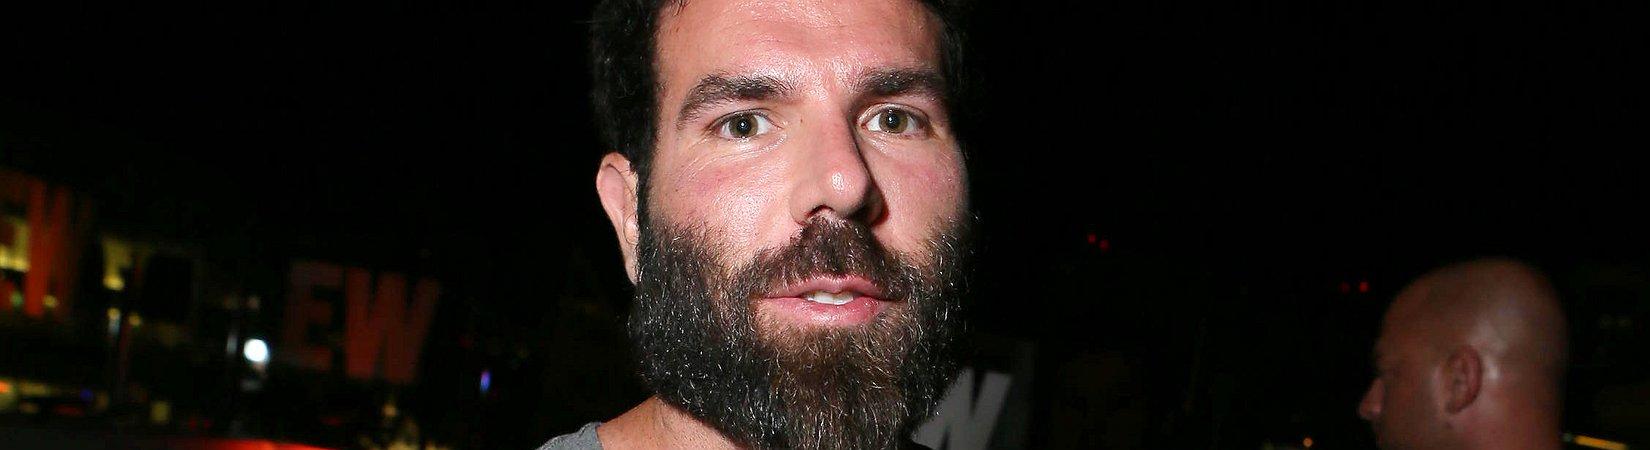 Wer ist Dan Bilzerian?